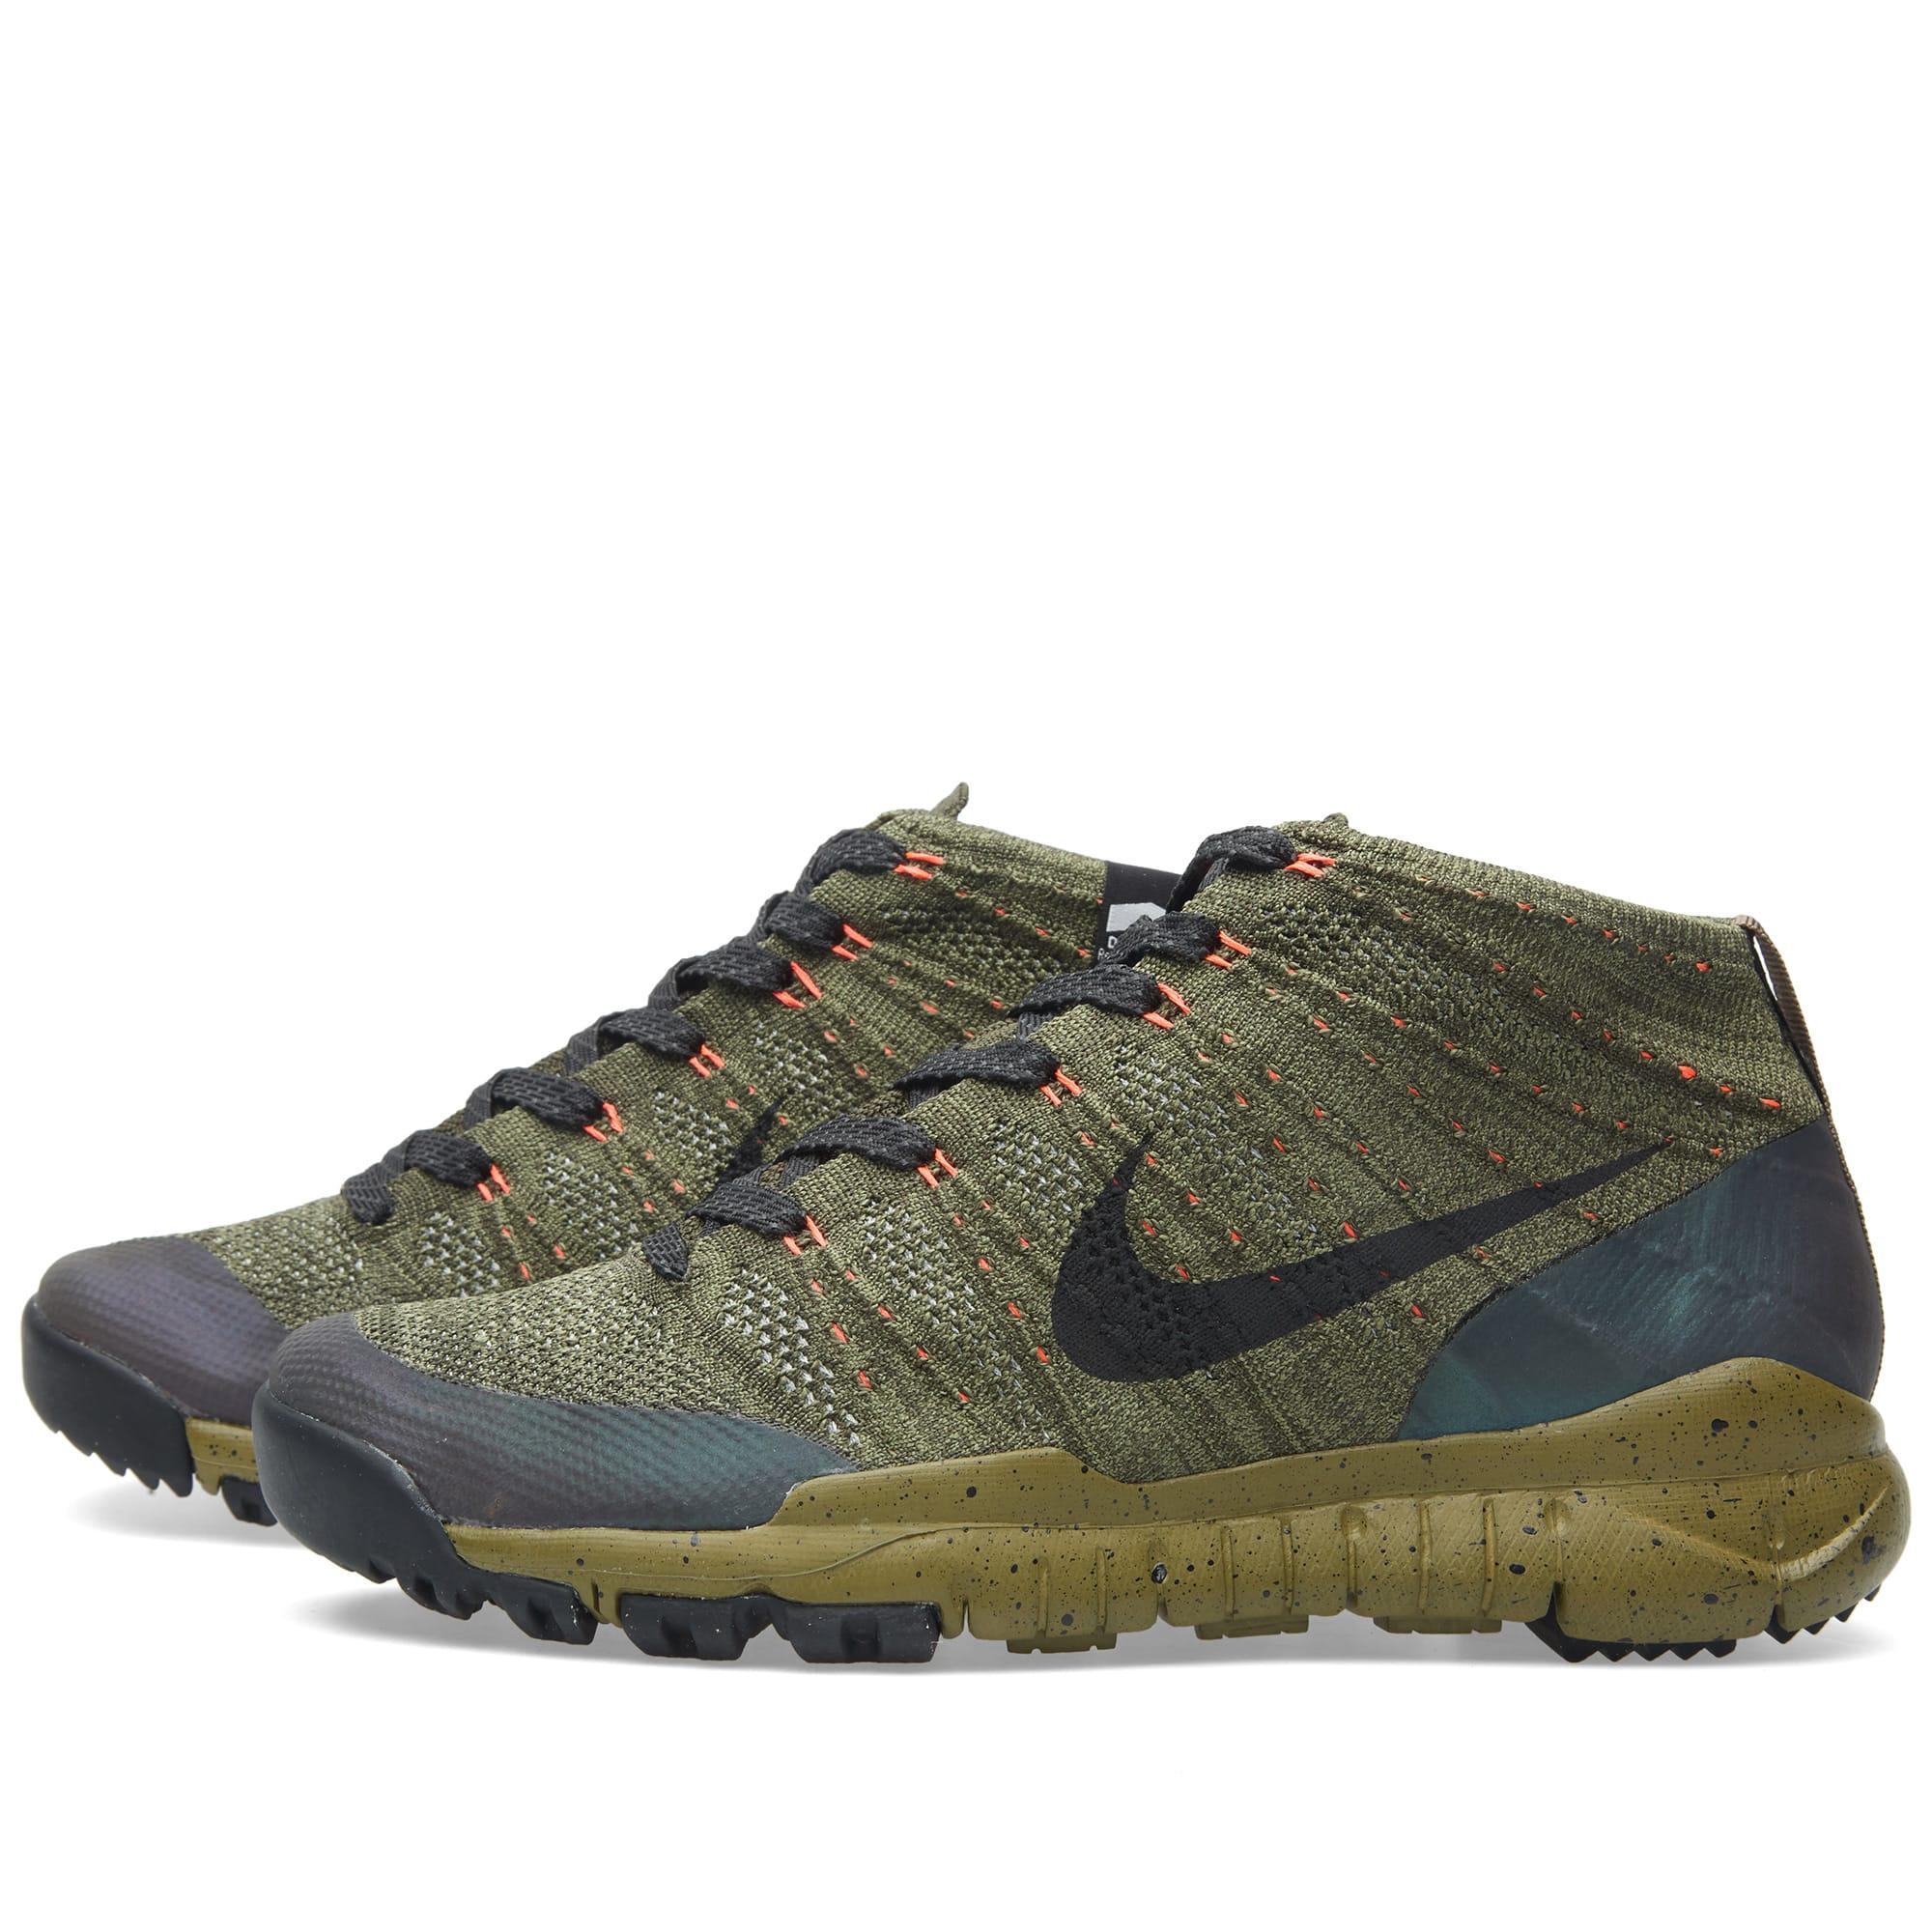 9037dbe7a5117 Nike Flyknit Trainer Chukka FSB Sequoia   Black